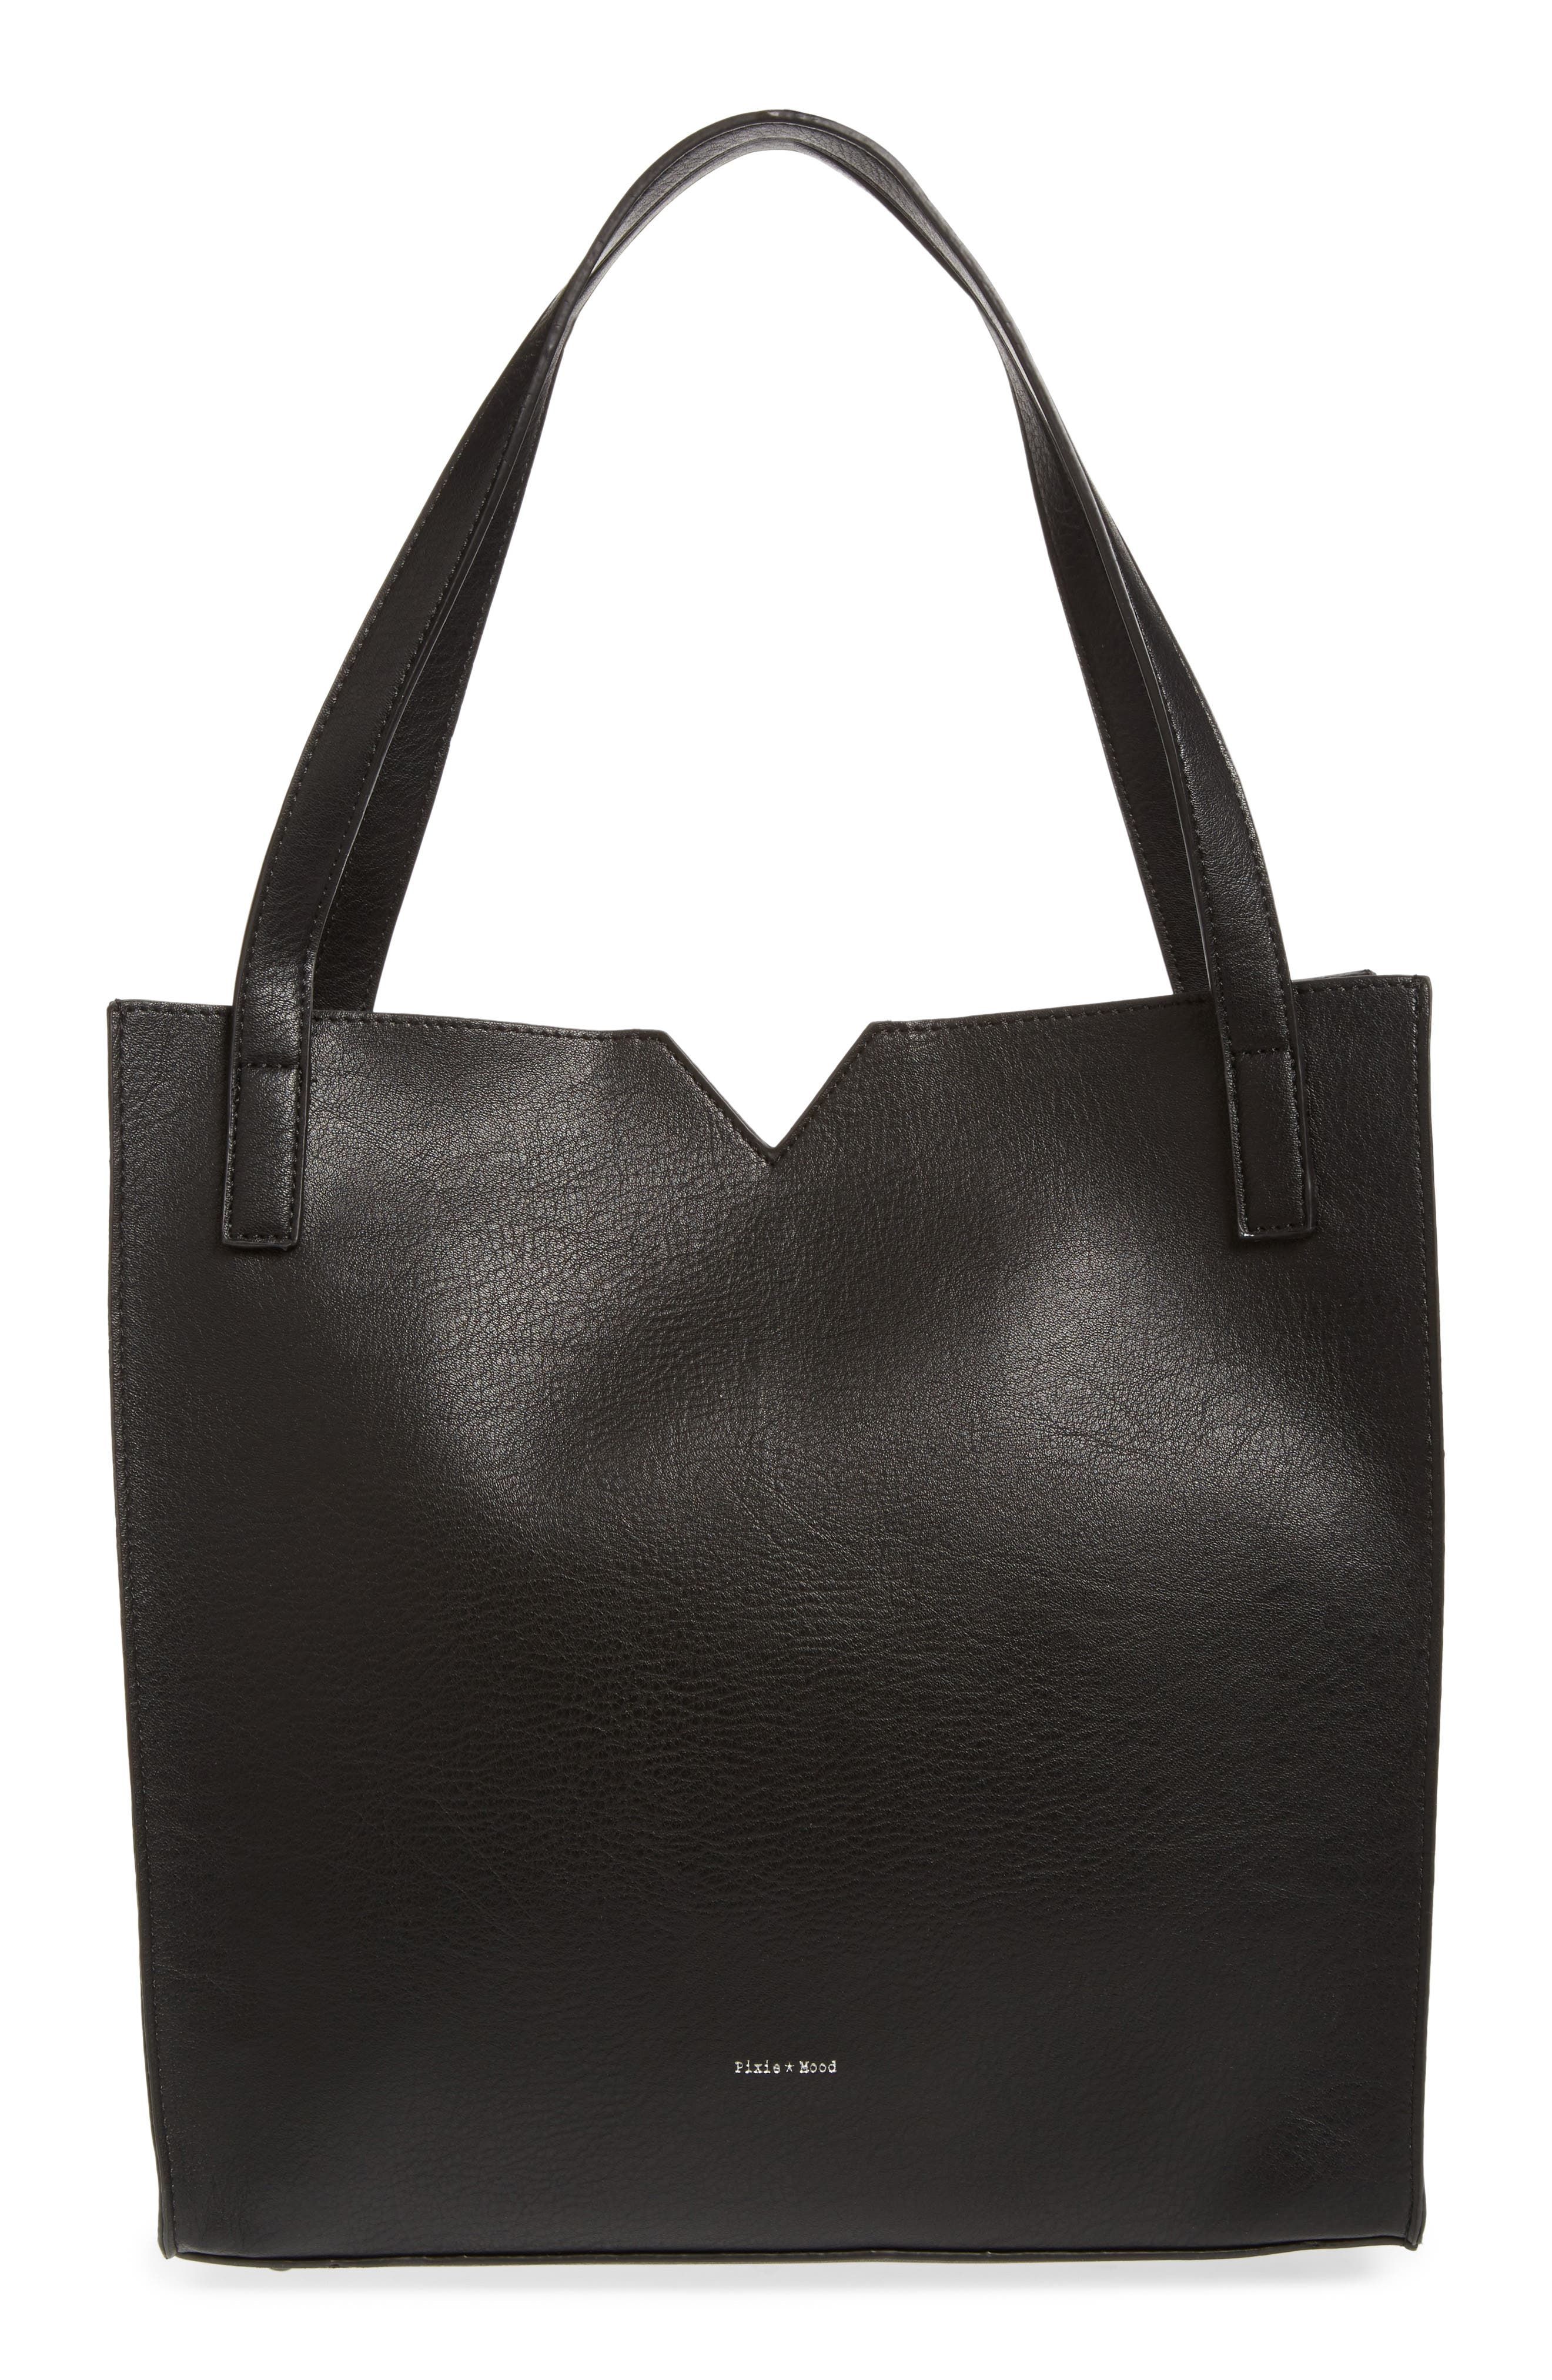 Alicia Faux Leather Tote Bag & Pouch Set, Main, color, 001